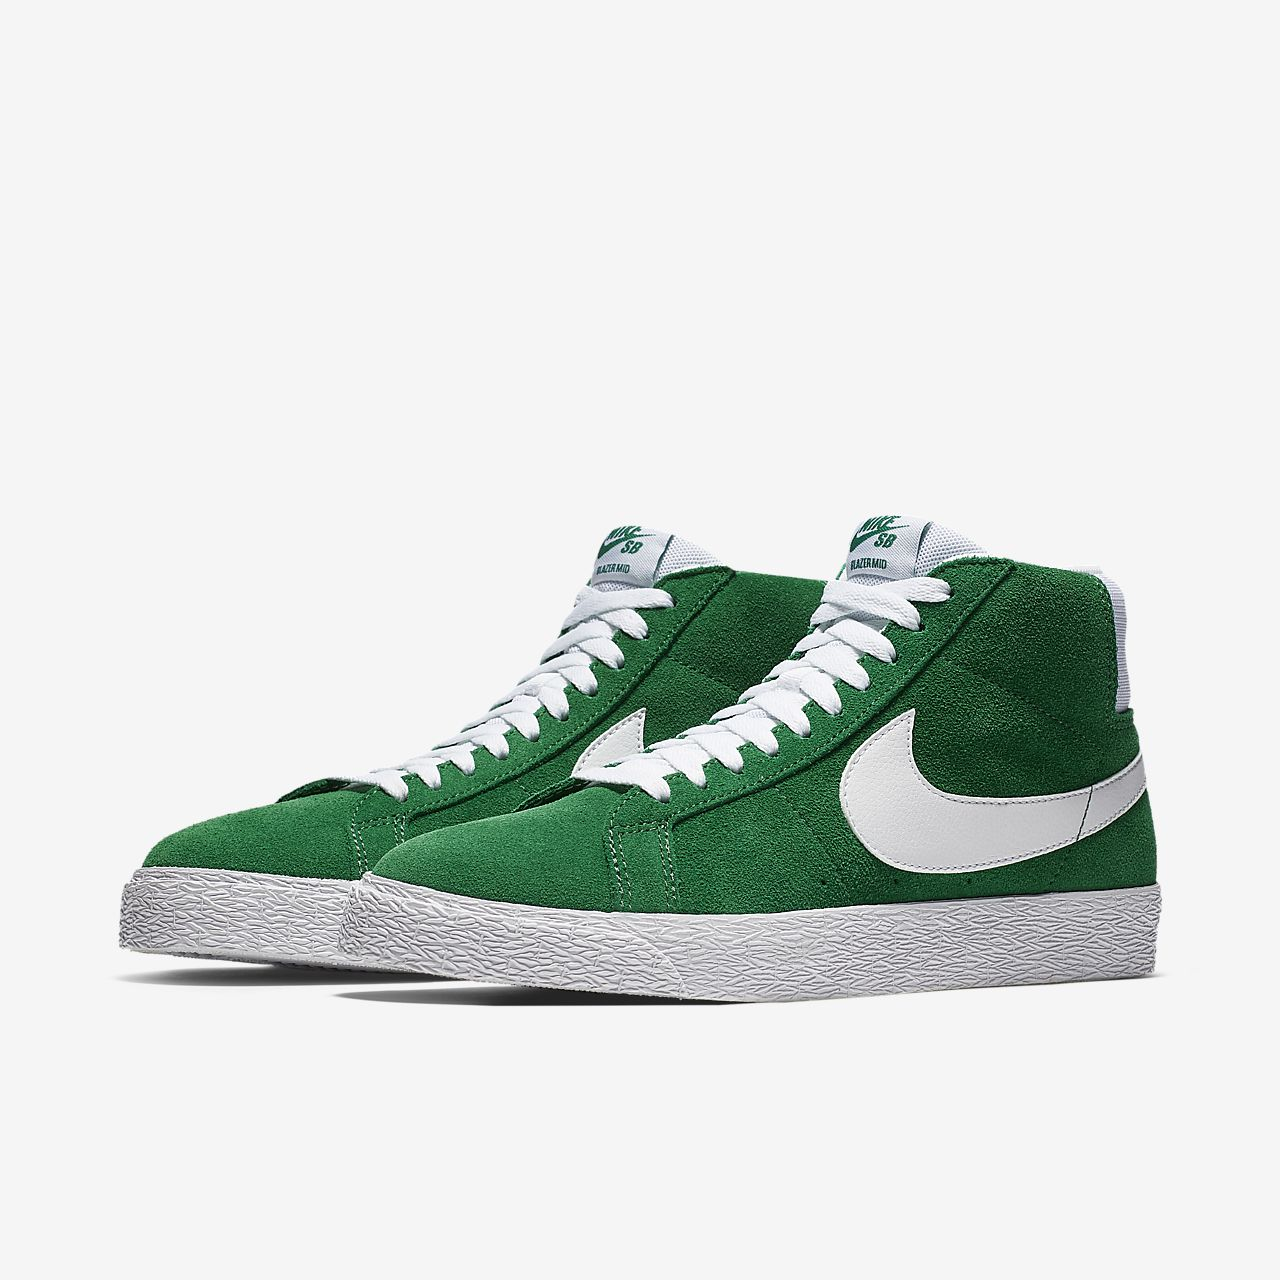 finest selection 3e4af 9d950 ... best nike blazer high zapatos venta para venta zapatos f25b0b 310d0  facd0